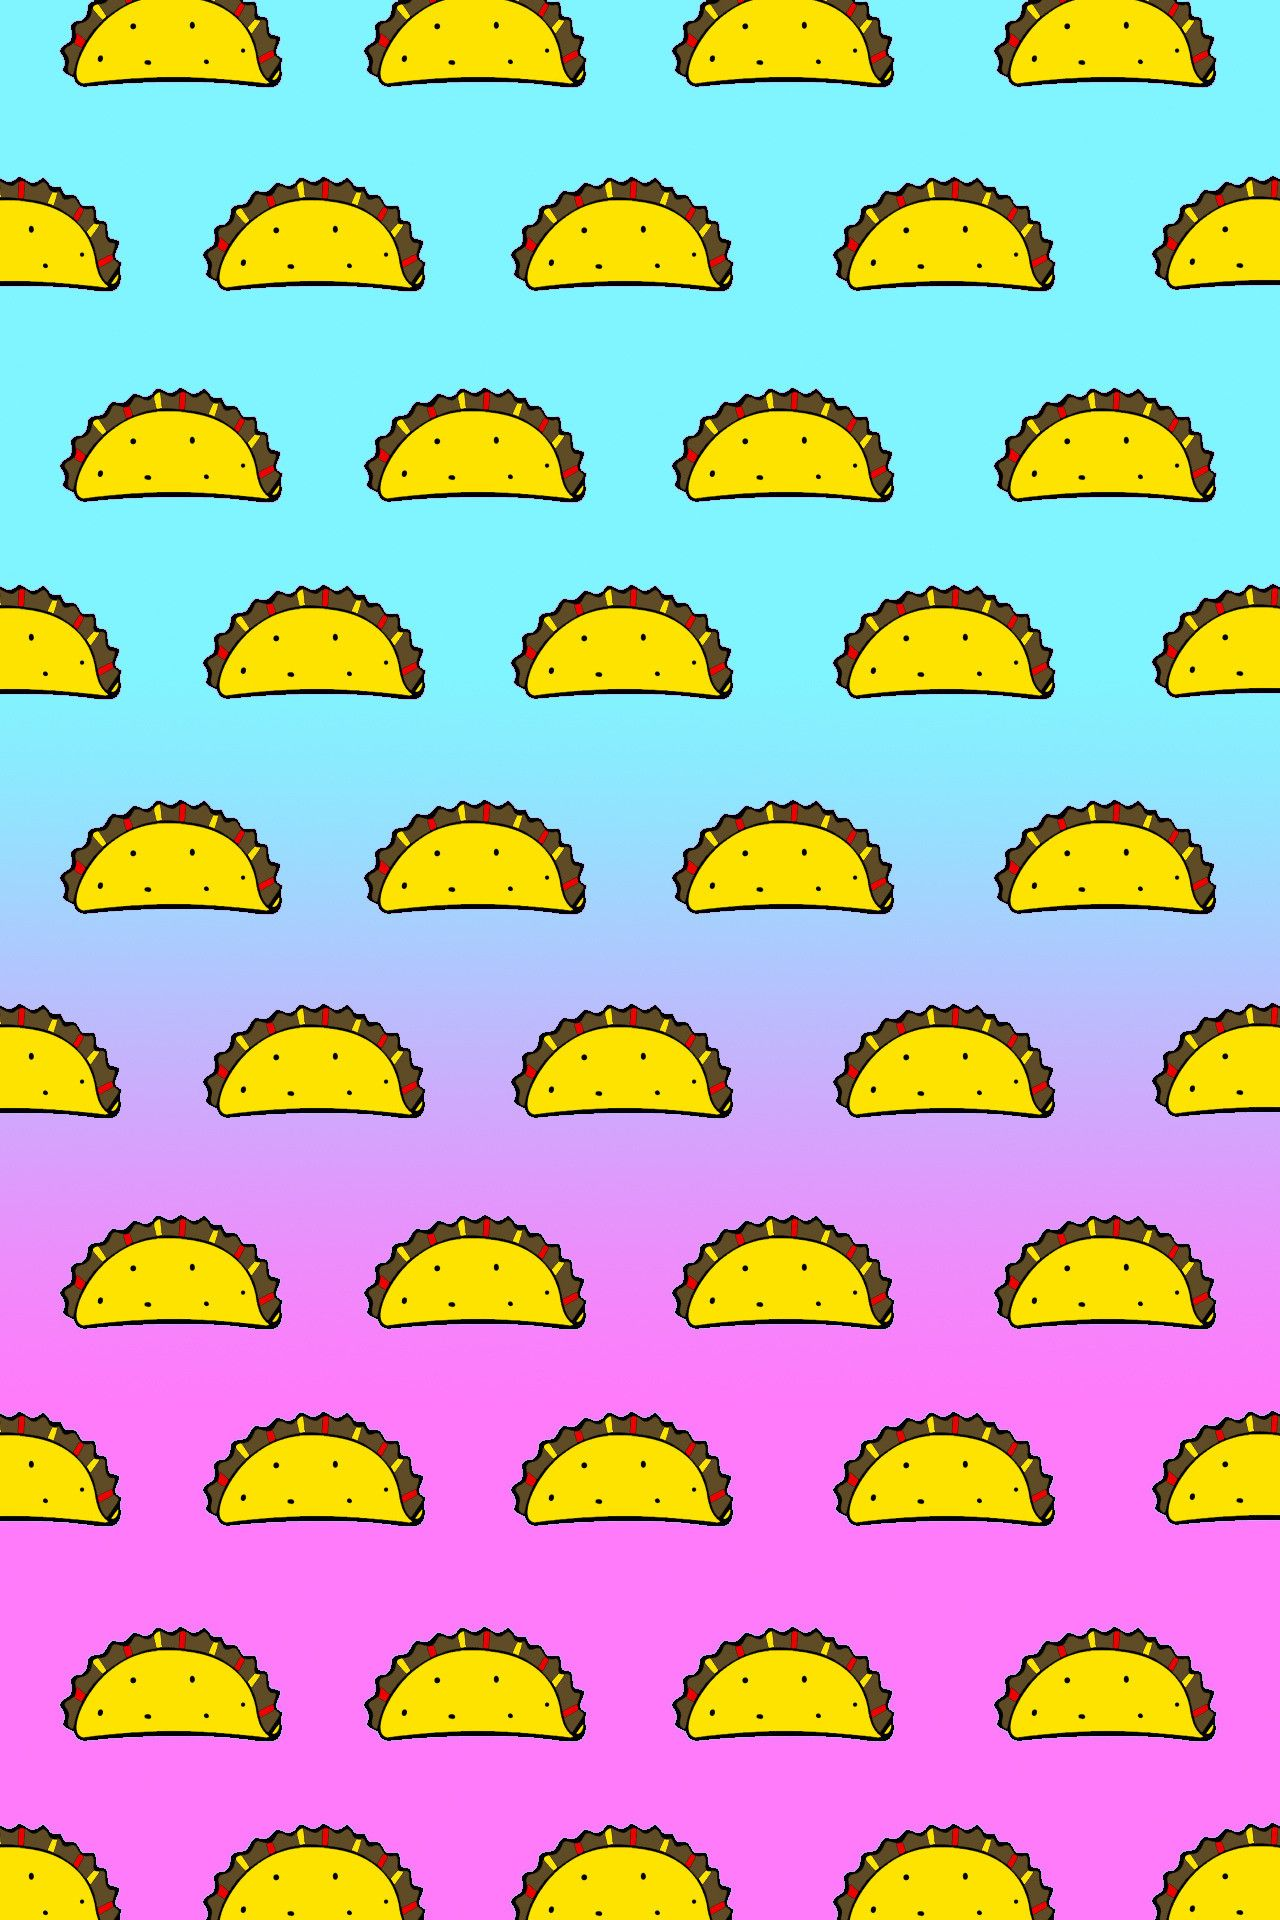 Kawaii Taco Wallpapers Top Free Kawaii Taco Backgrounds Wallpaperaccess